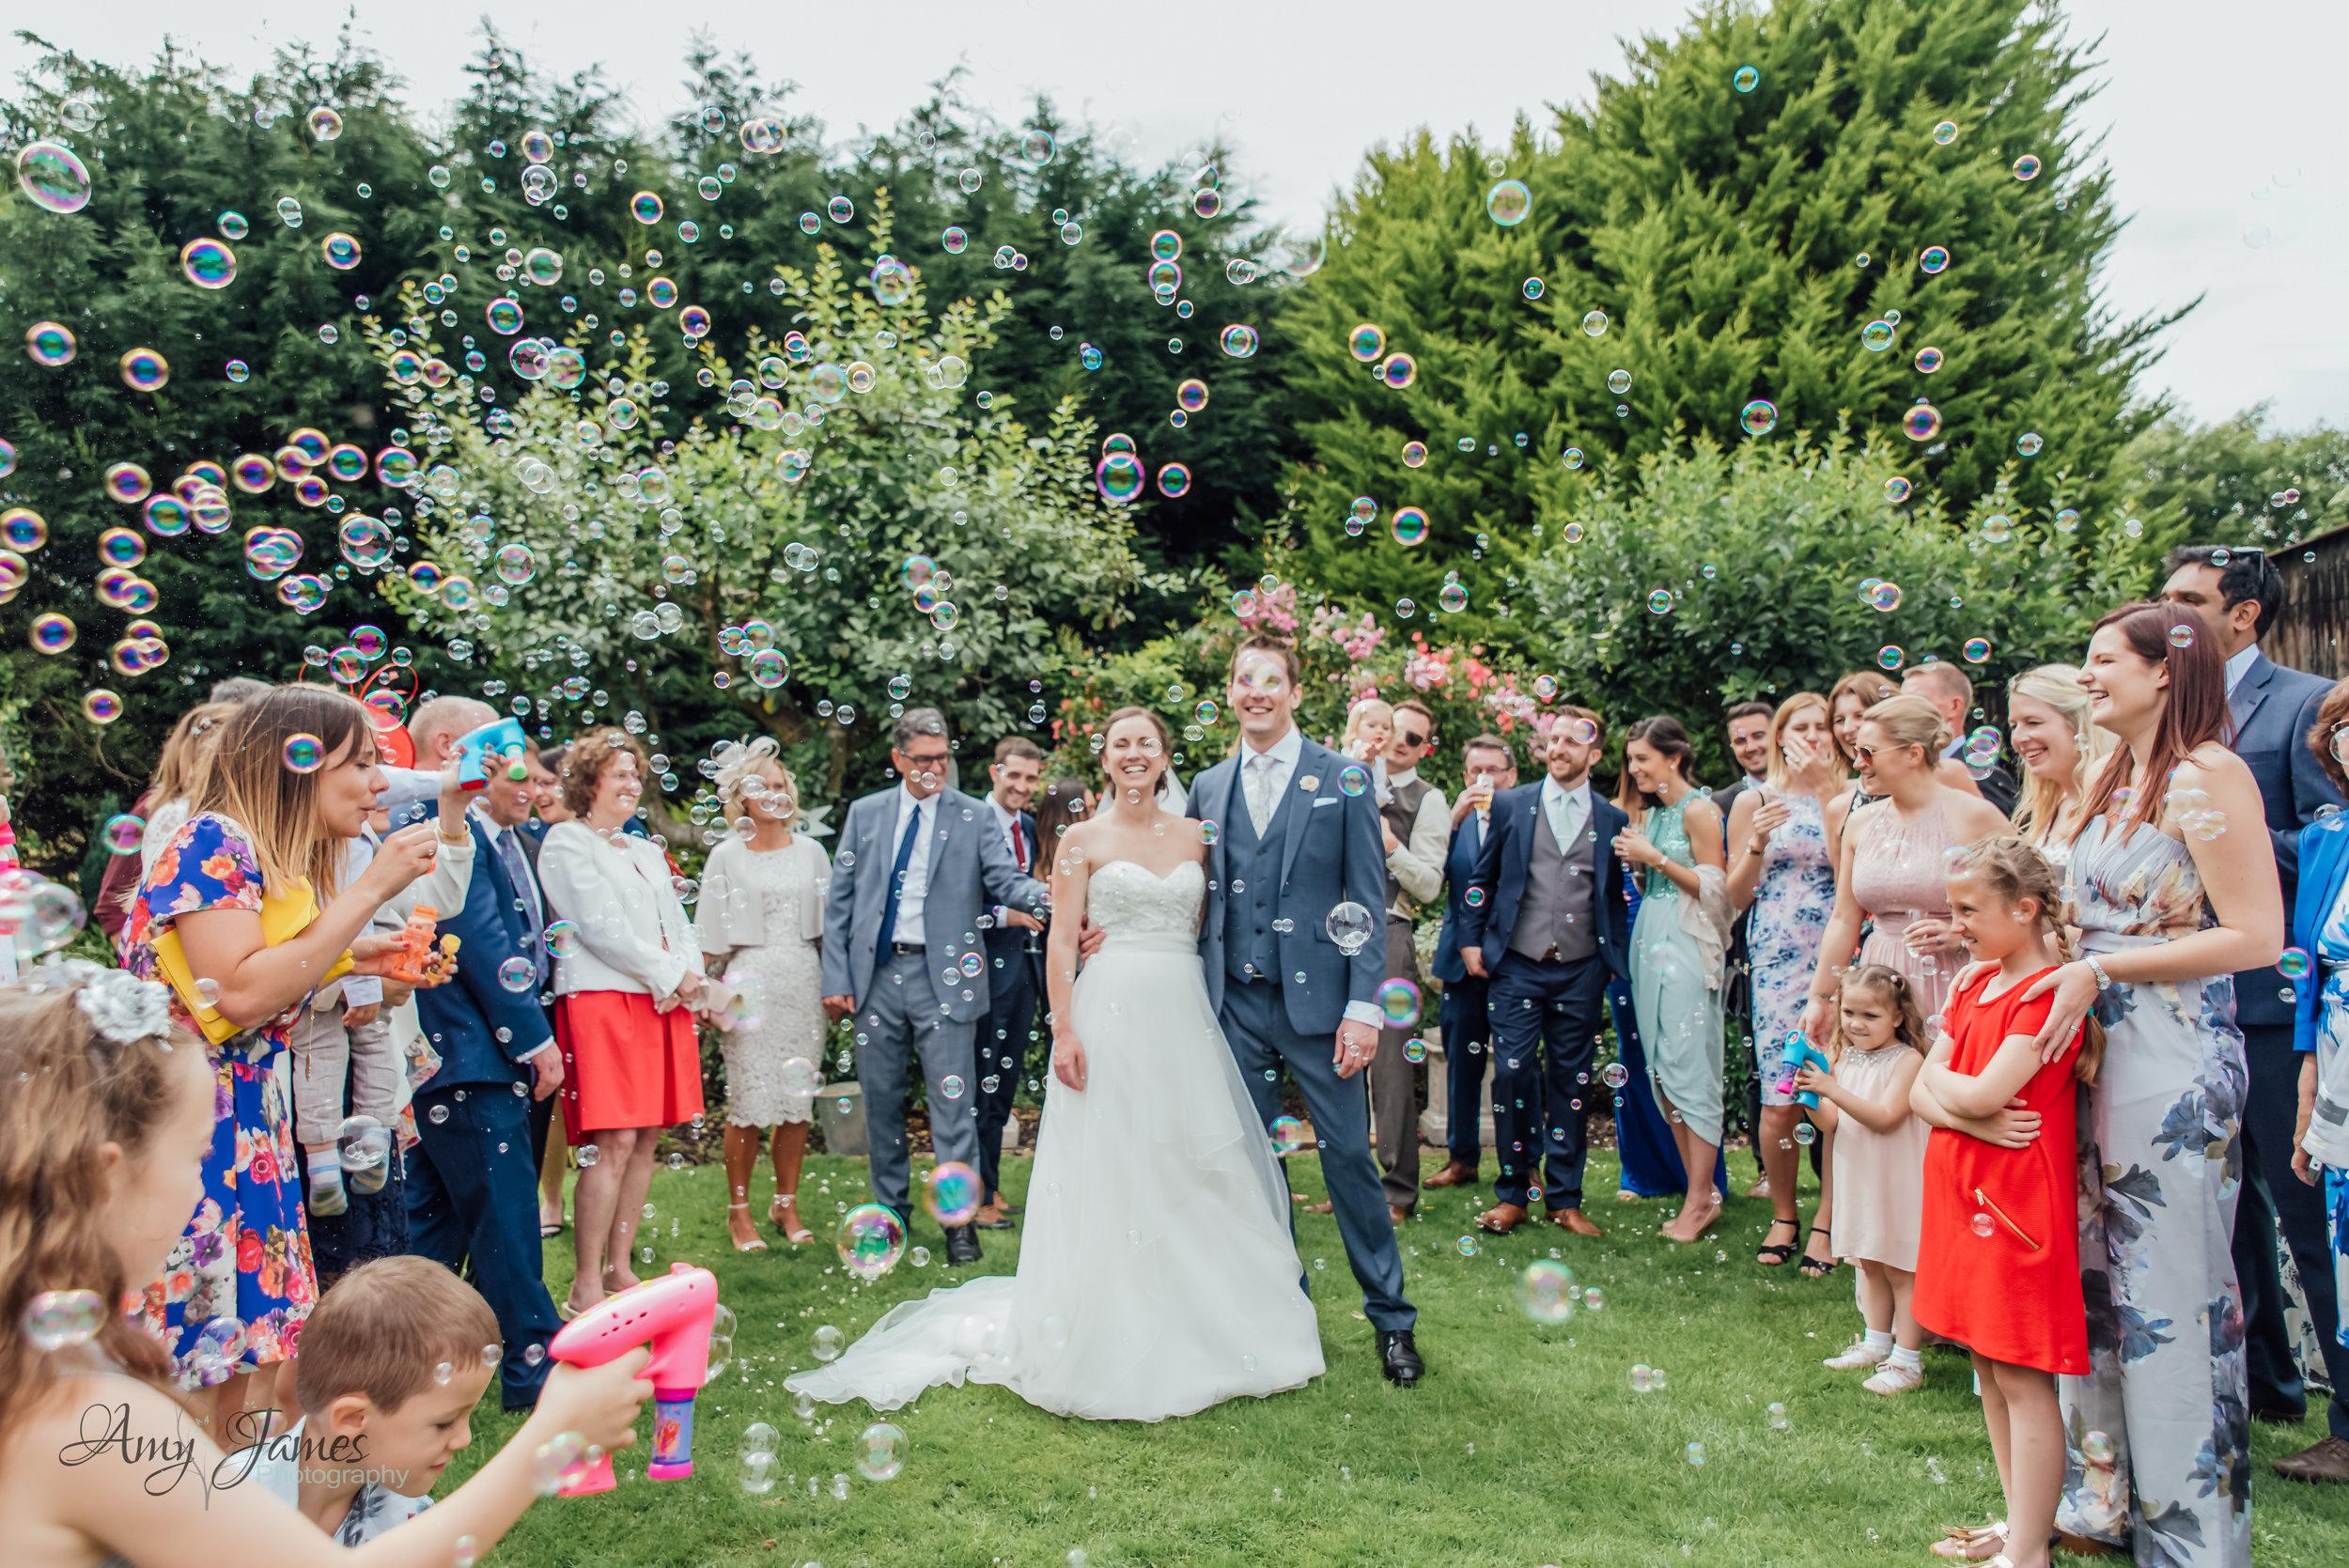 Bubble gun wedding confetti at outdoor wedding venue Hampshire - Amy James Photography Hampshire Fleet wedding photographer